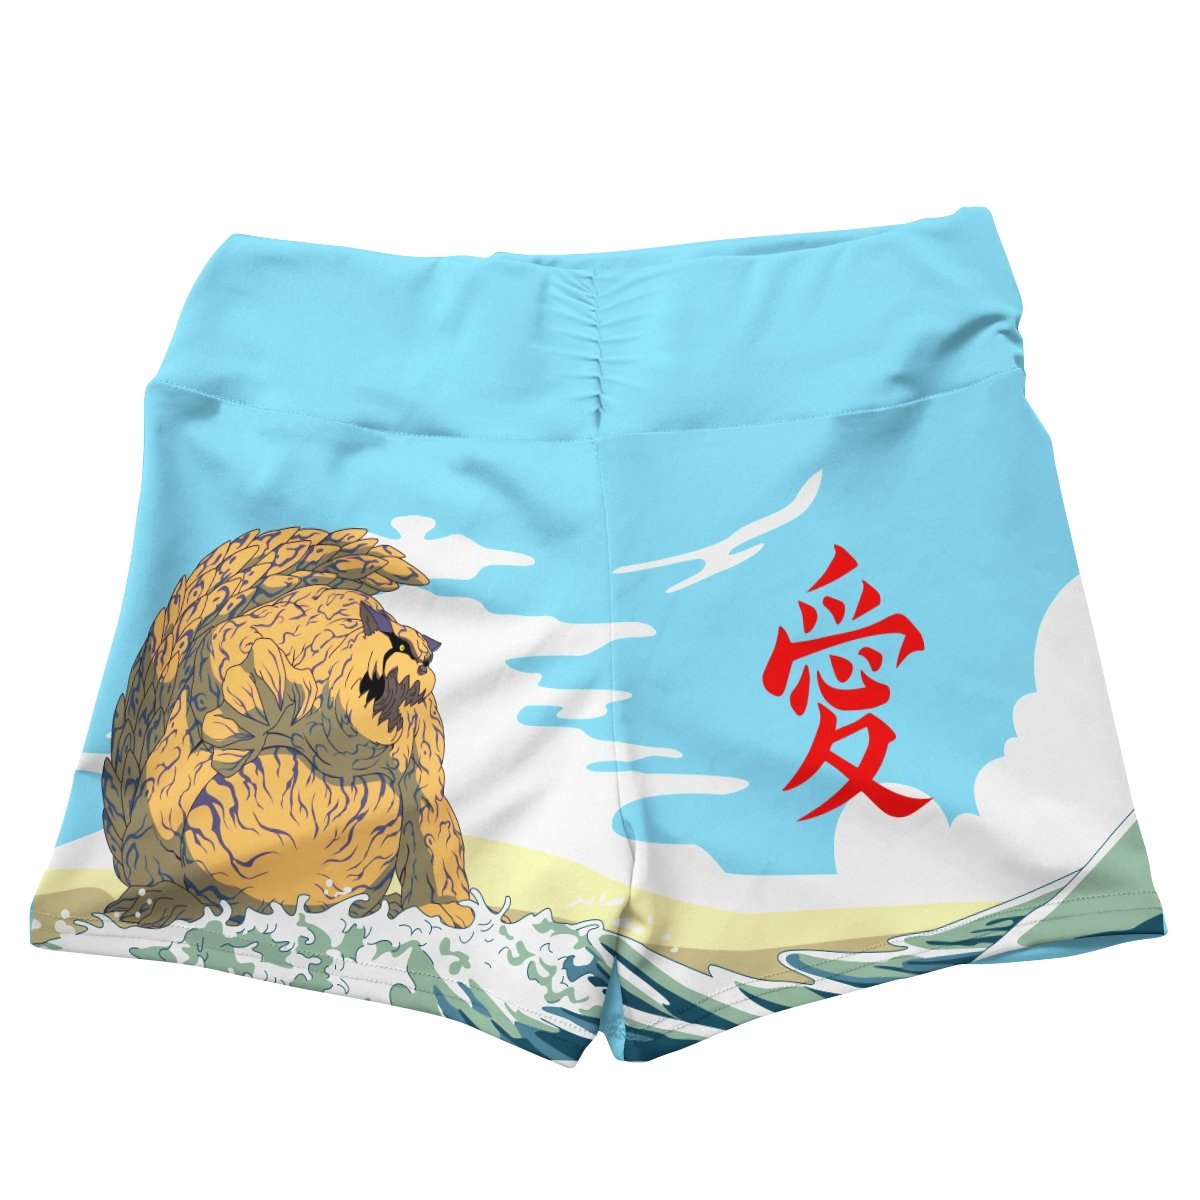 gaara summer active wear set 260456 - Anime Swimsuits